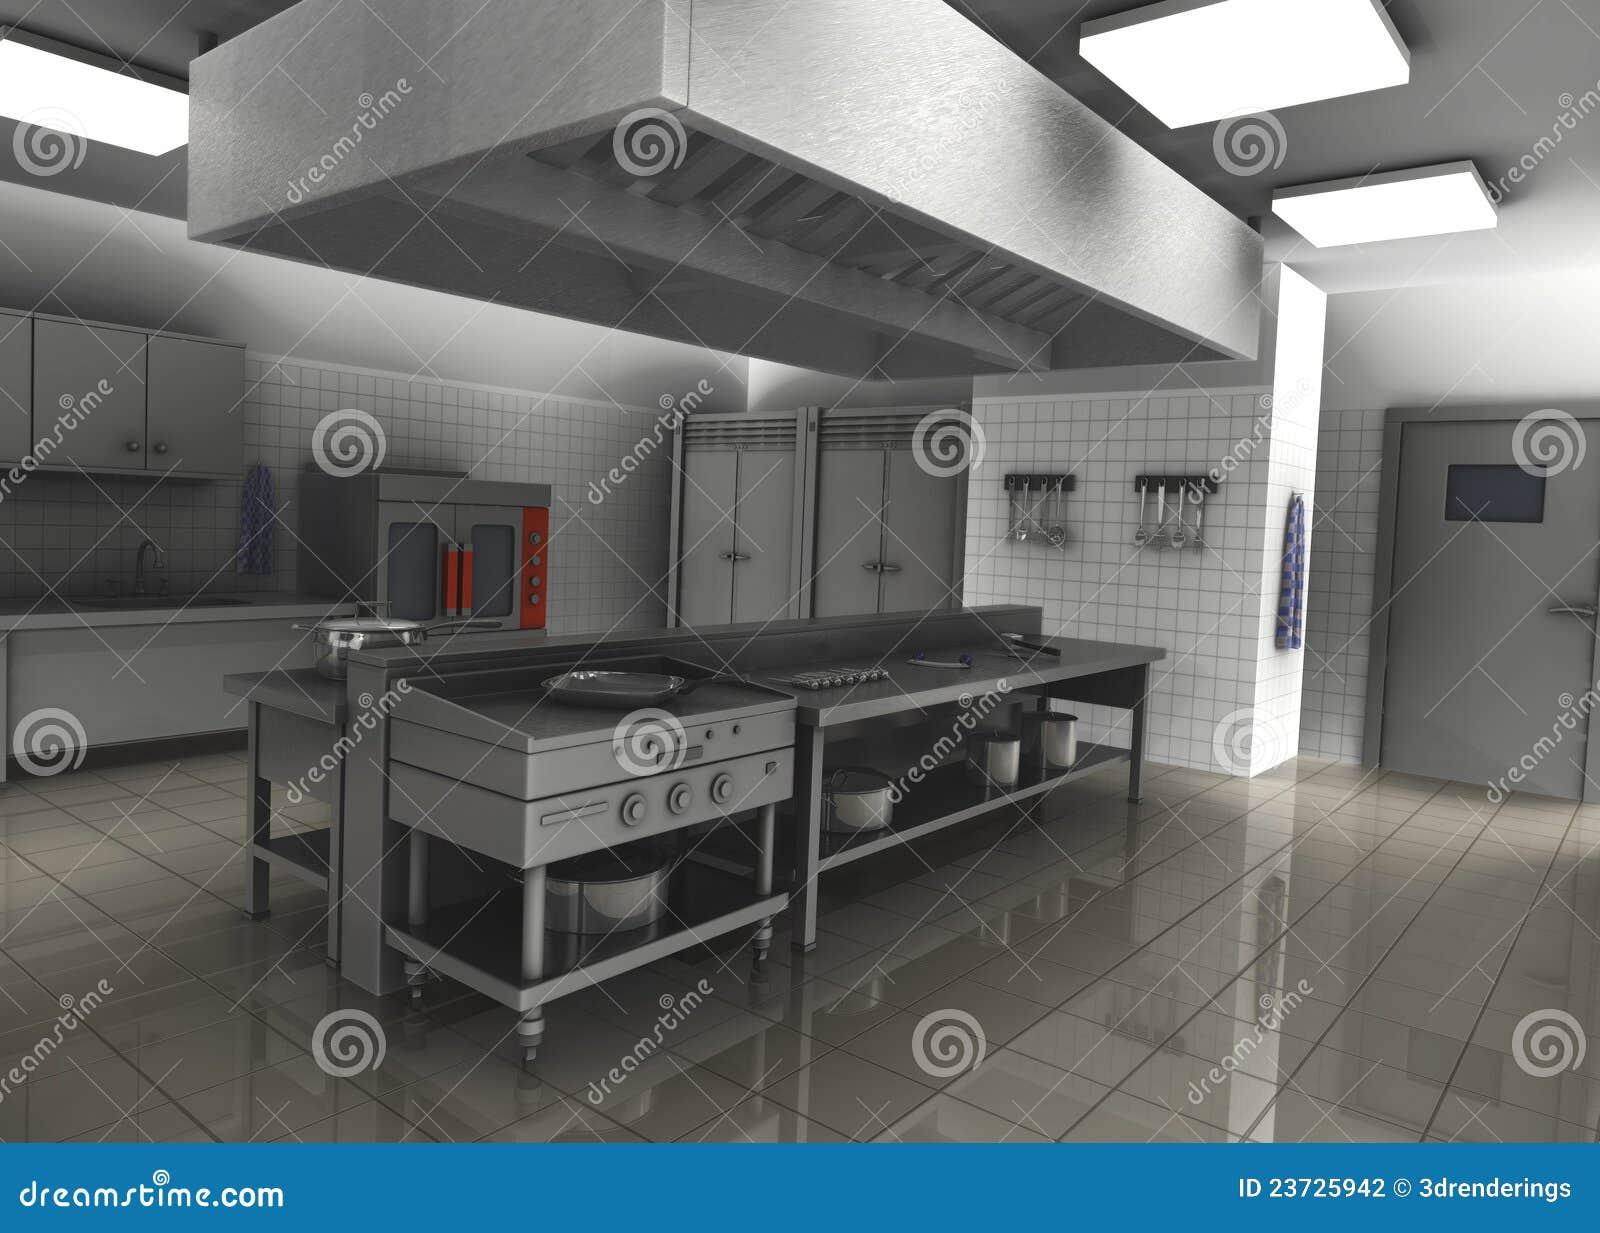 cocina de un restaurant: